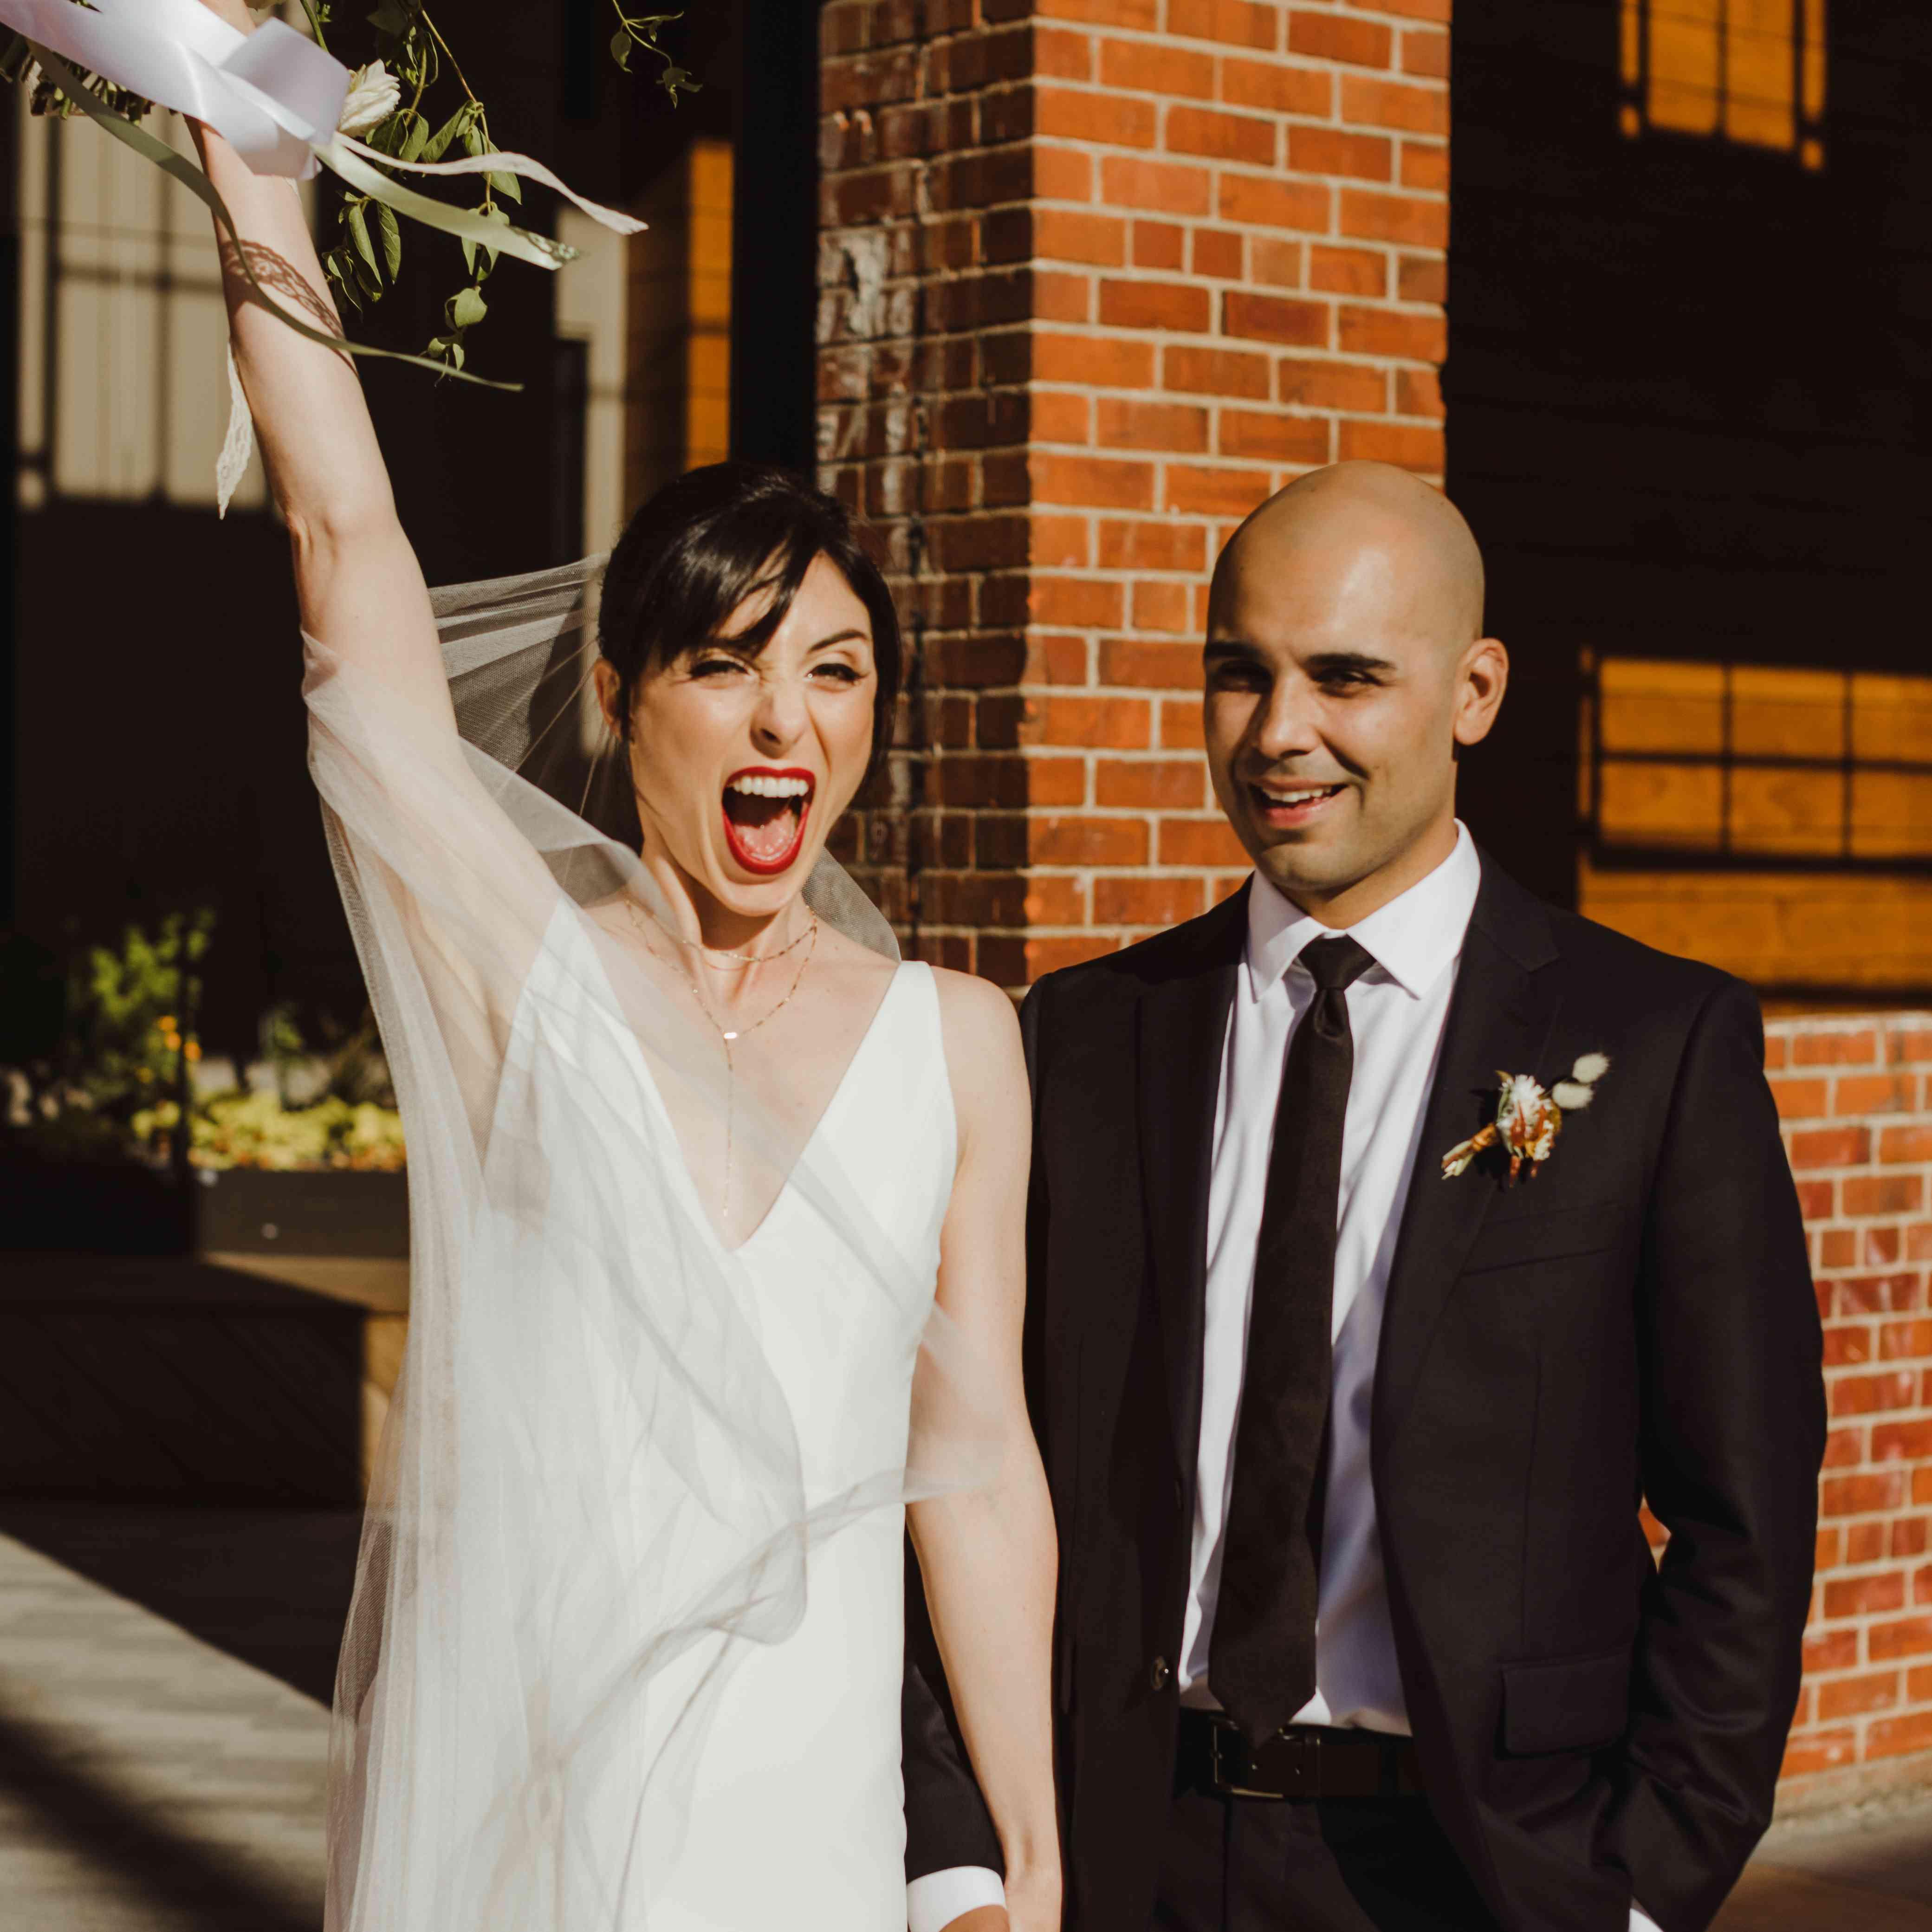 <p>ceremony exit excited bride</p><br><br>